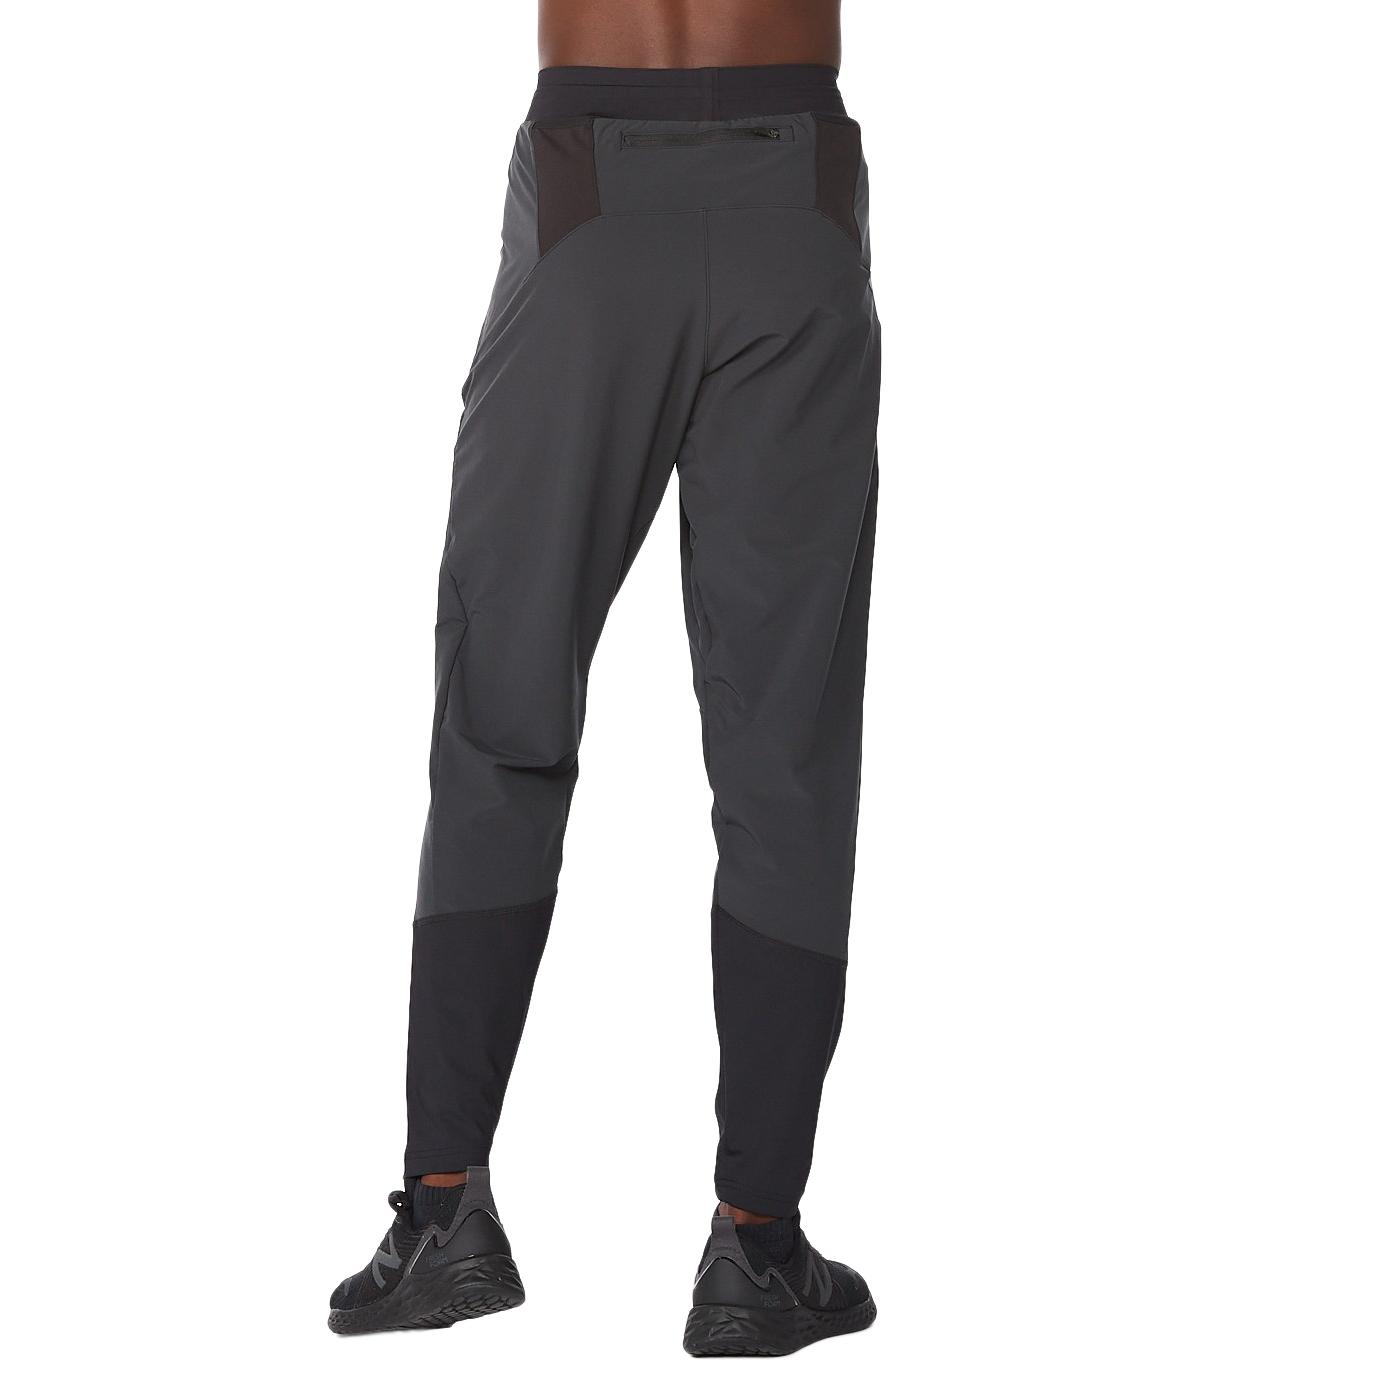 Imagen de 2XU Light Speed Jogger Pantalon - black/black reflective